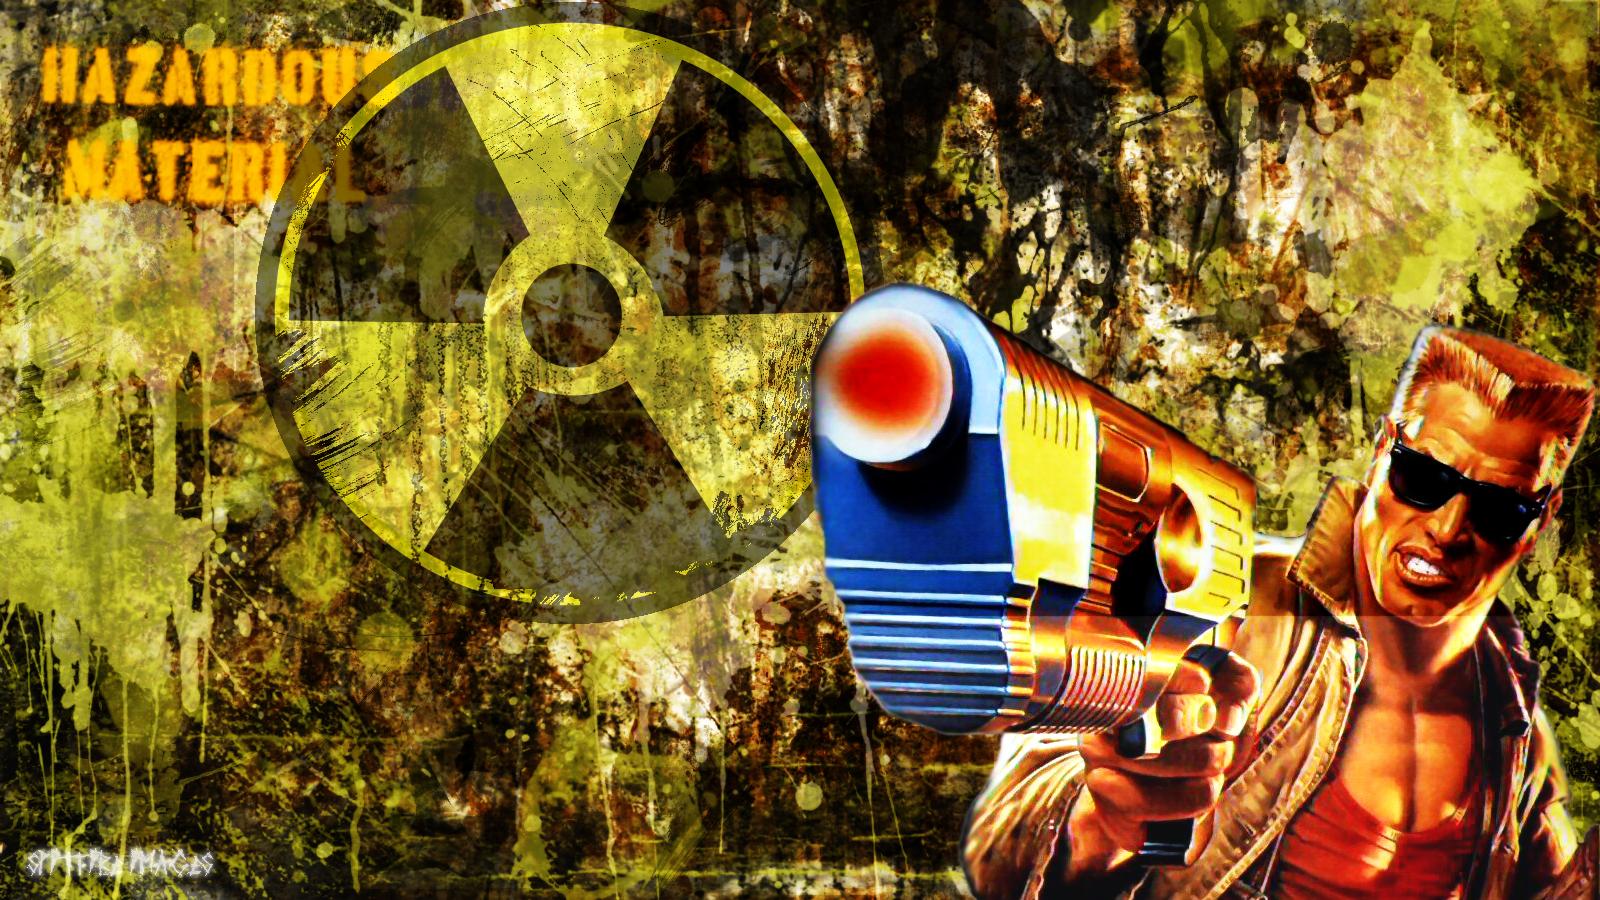 Duke Nukem Wallpaper By Spitfire666xXxXx